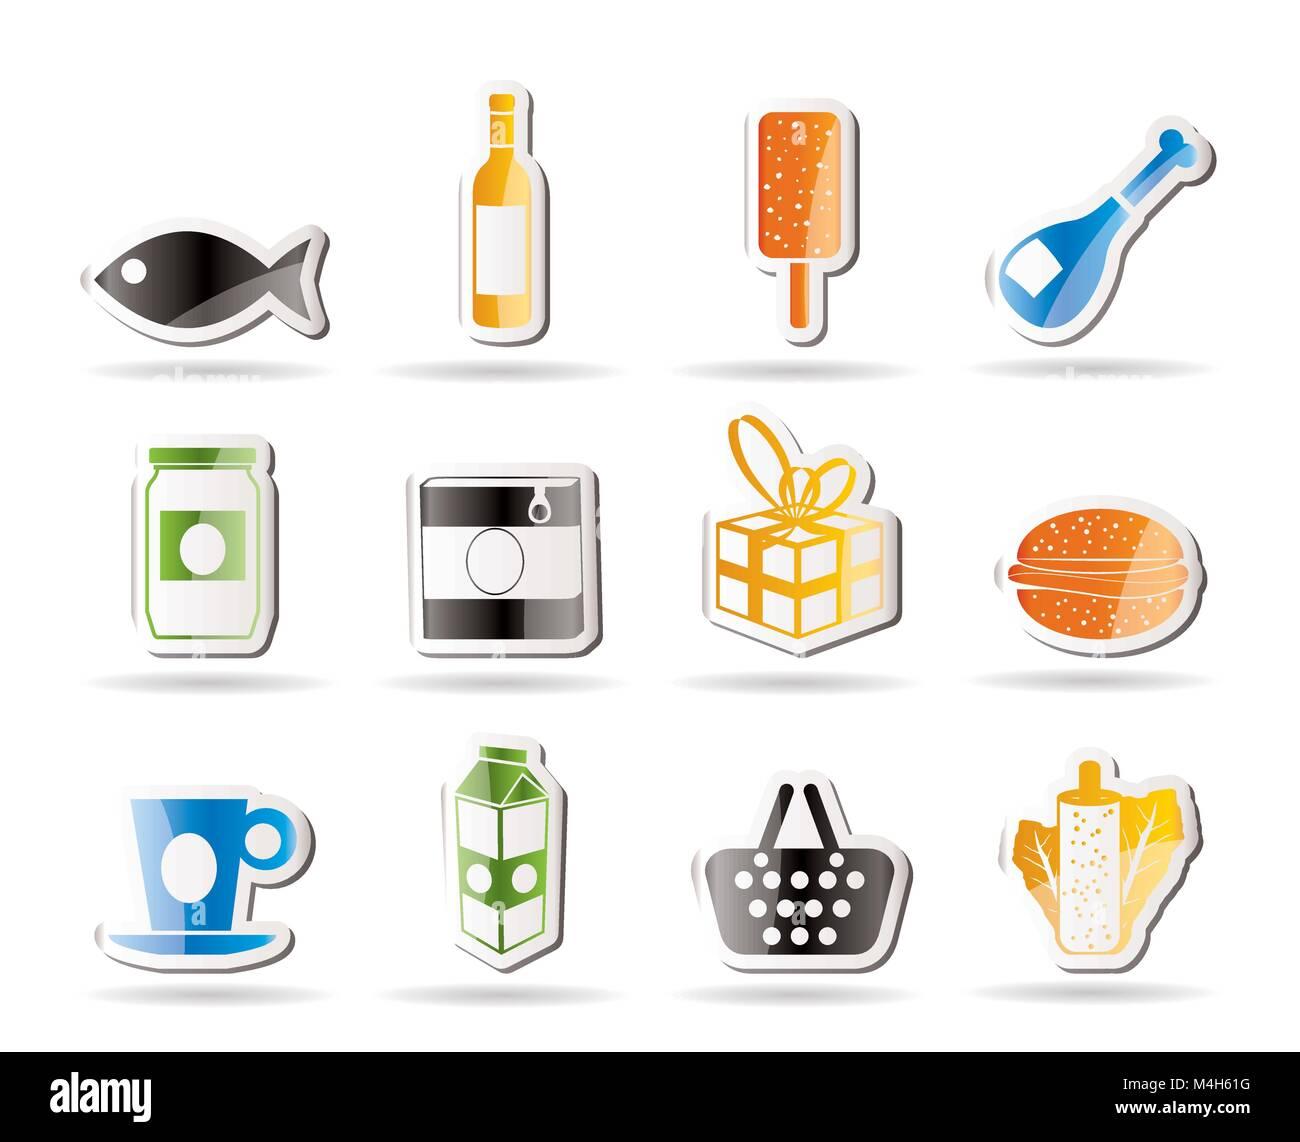 Supermarkt Lebensmittelgeschäft Computer Icons Logo Albert Heijn, Trolly,  Albert Heijn, Schwarz und weiß, Computer-Icons png | PNGWing